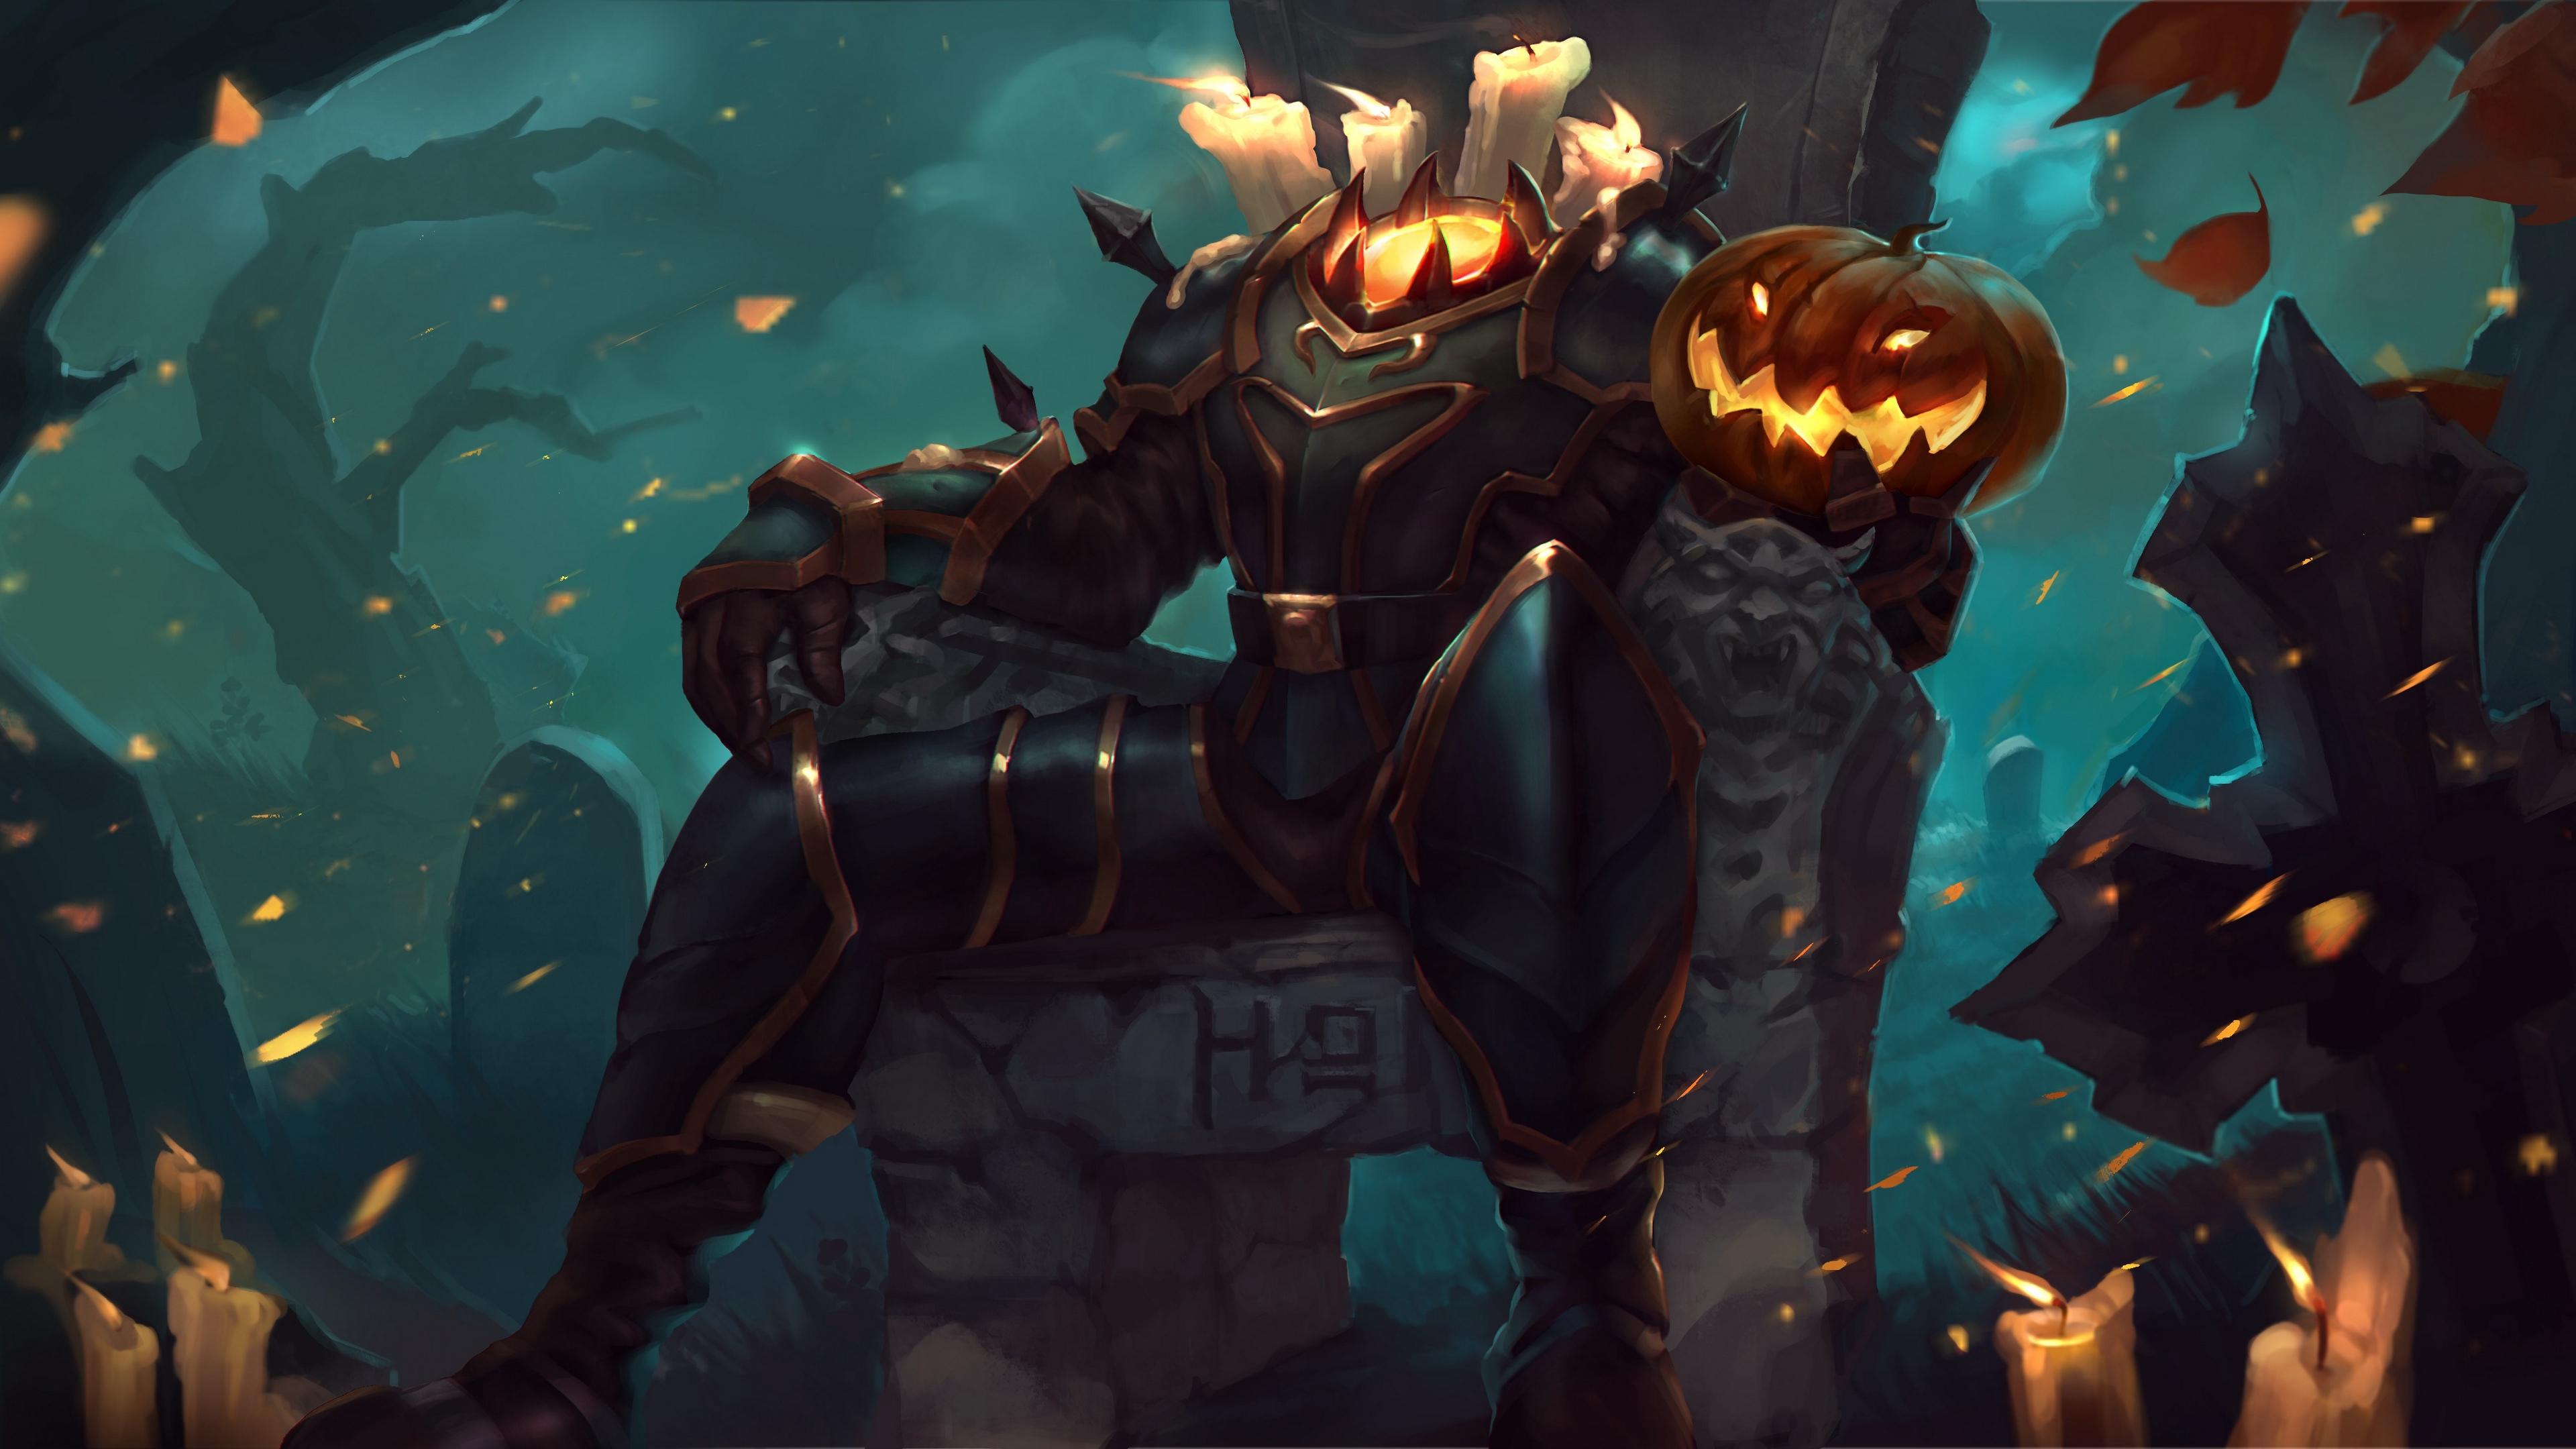 Wallpaper 4k Heroes Of Newerth Transmutenstein Hon Halloween 4k